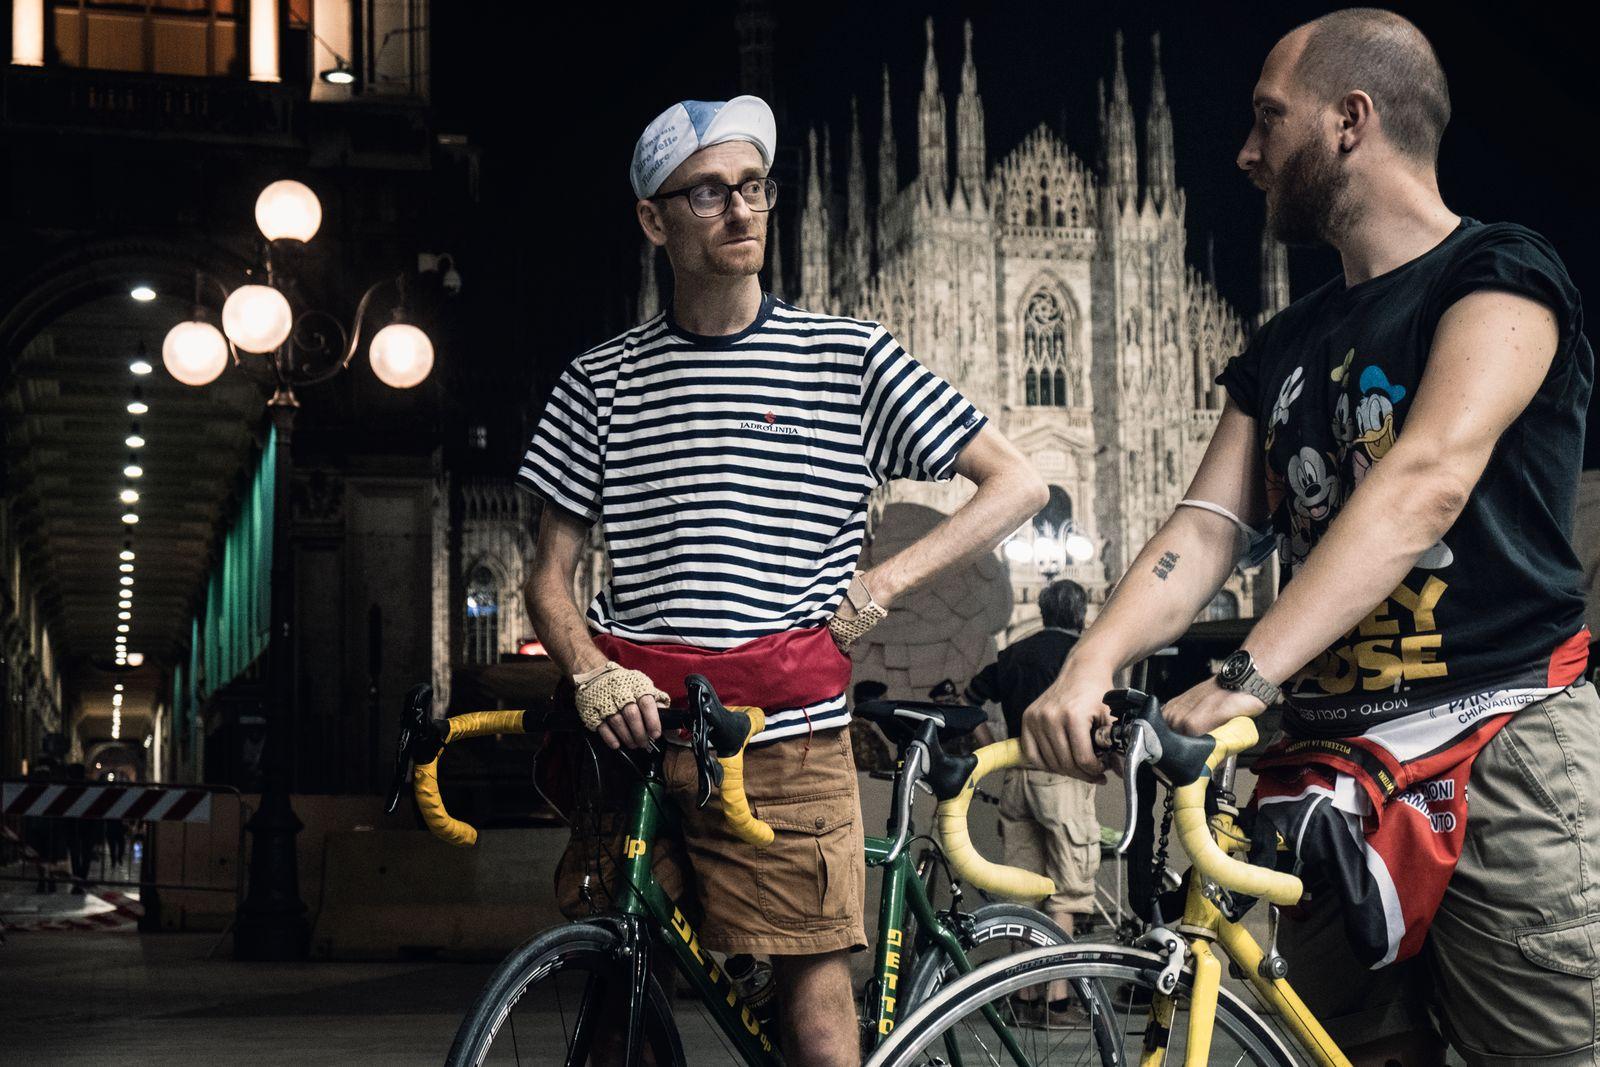 milano bike_30